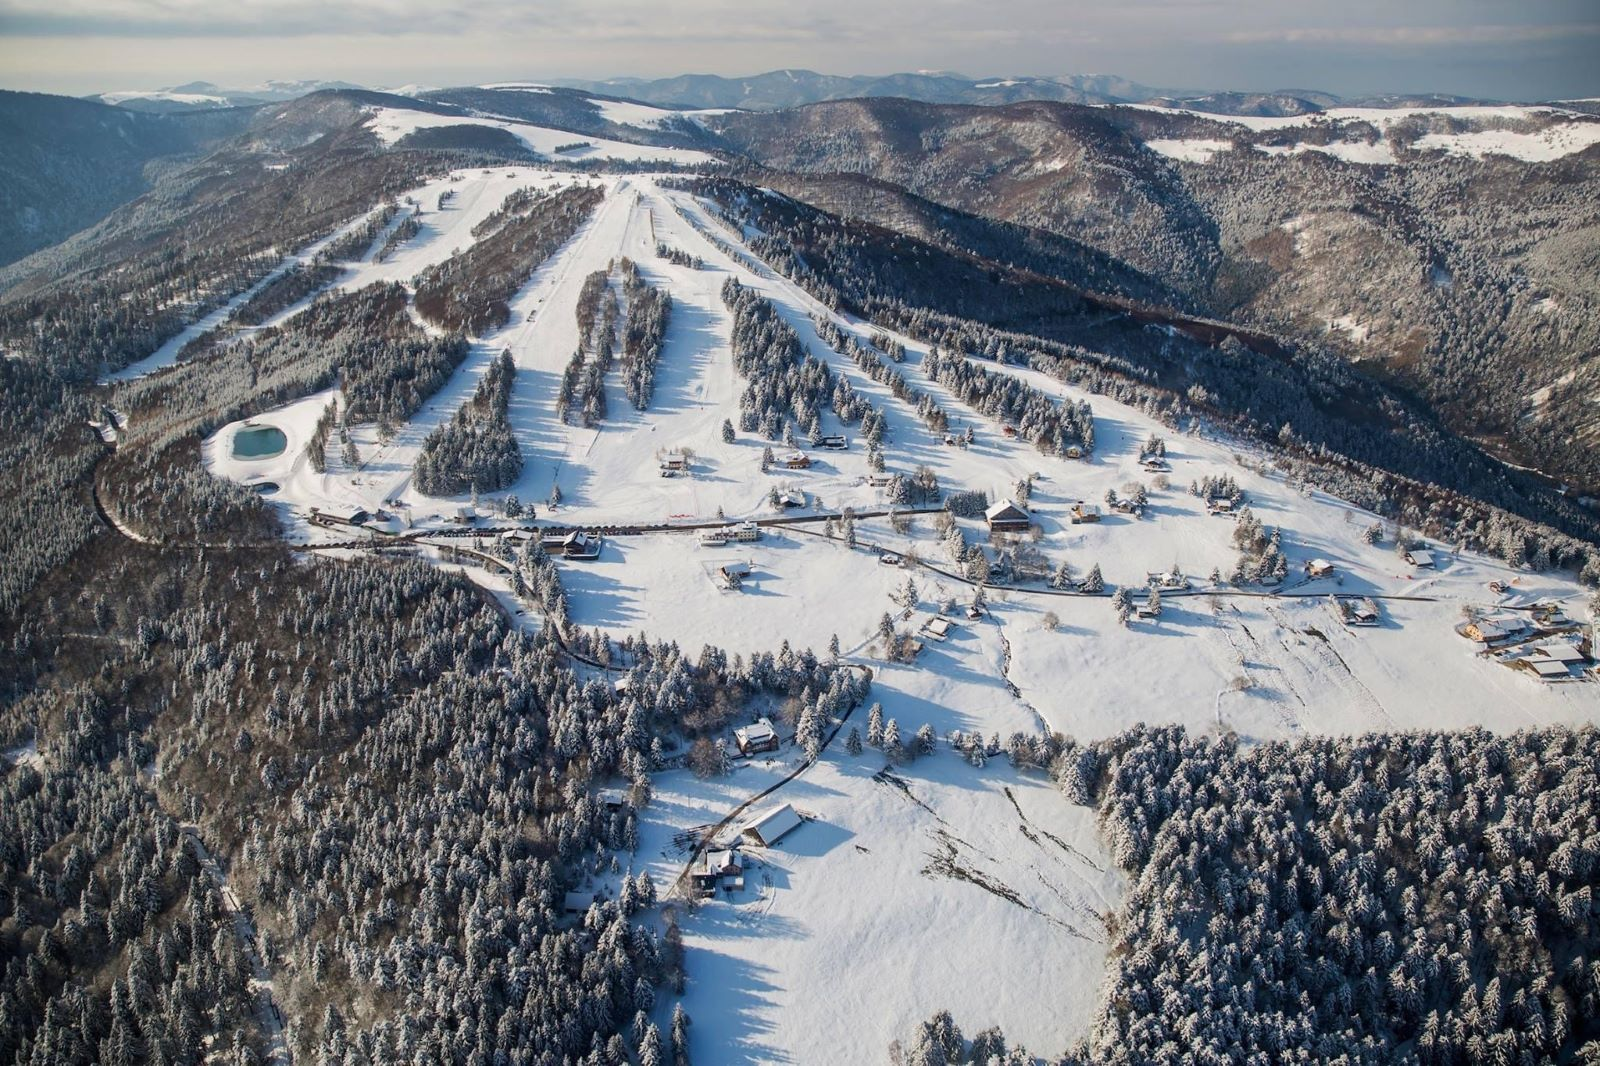 Station de ski du Schnepfenried